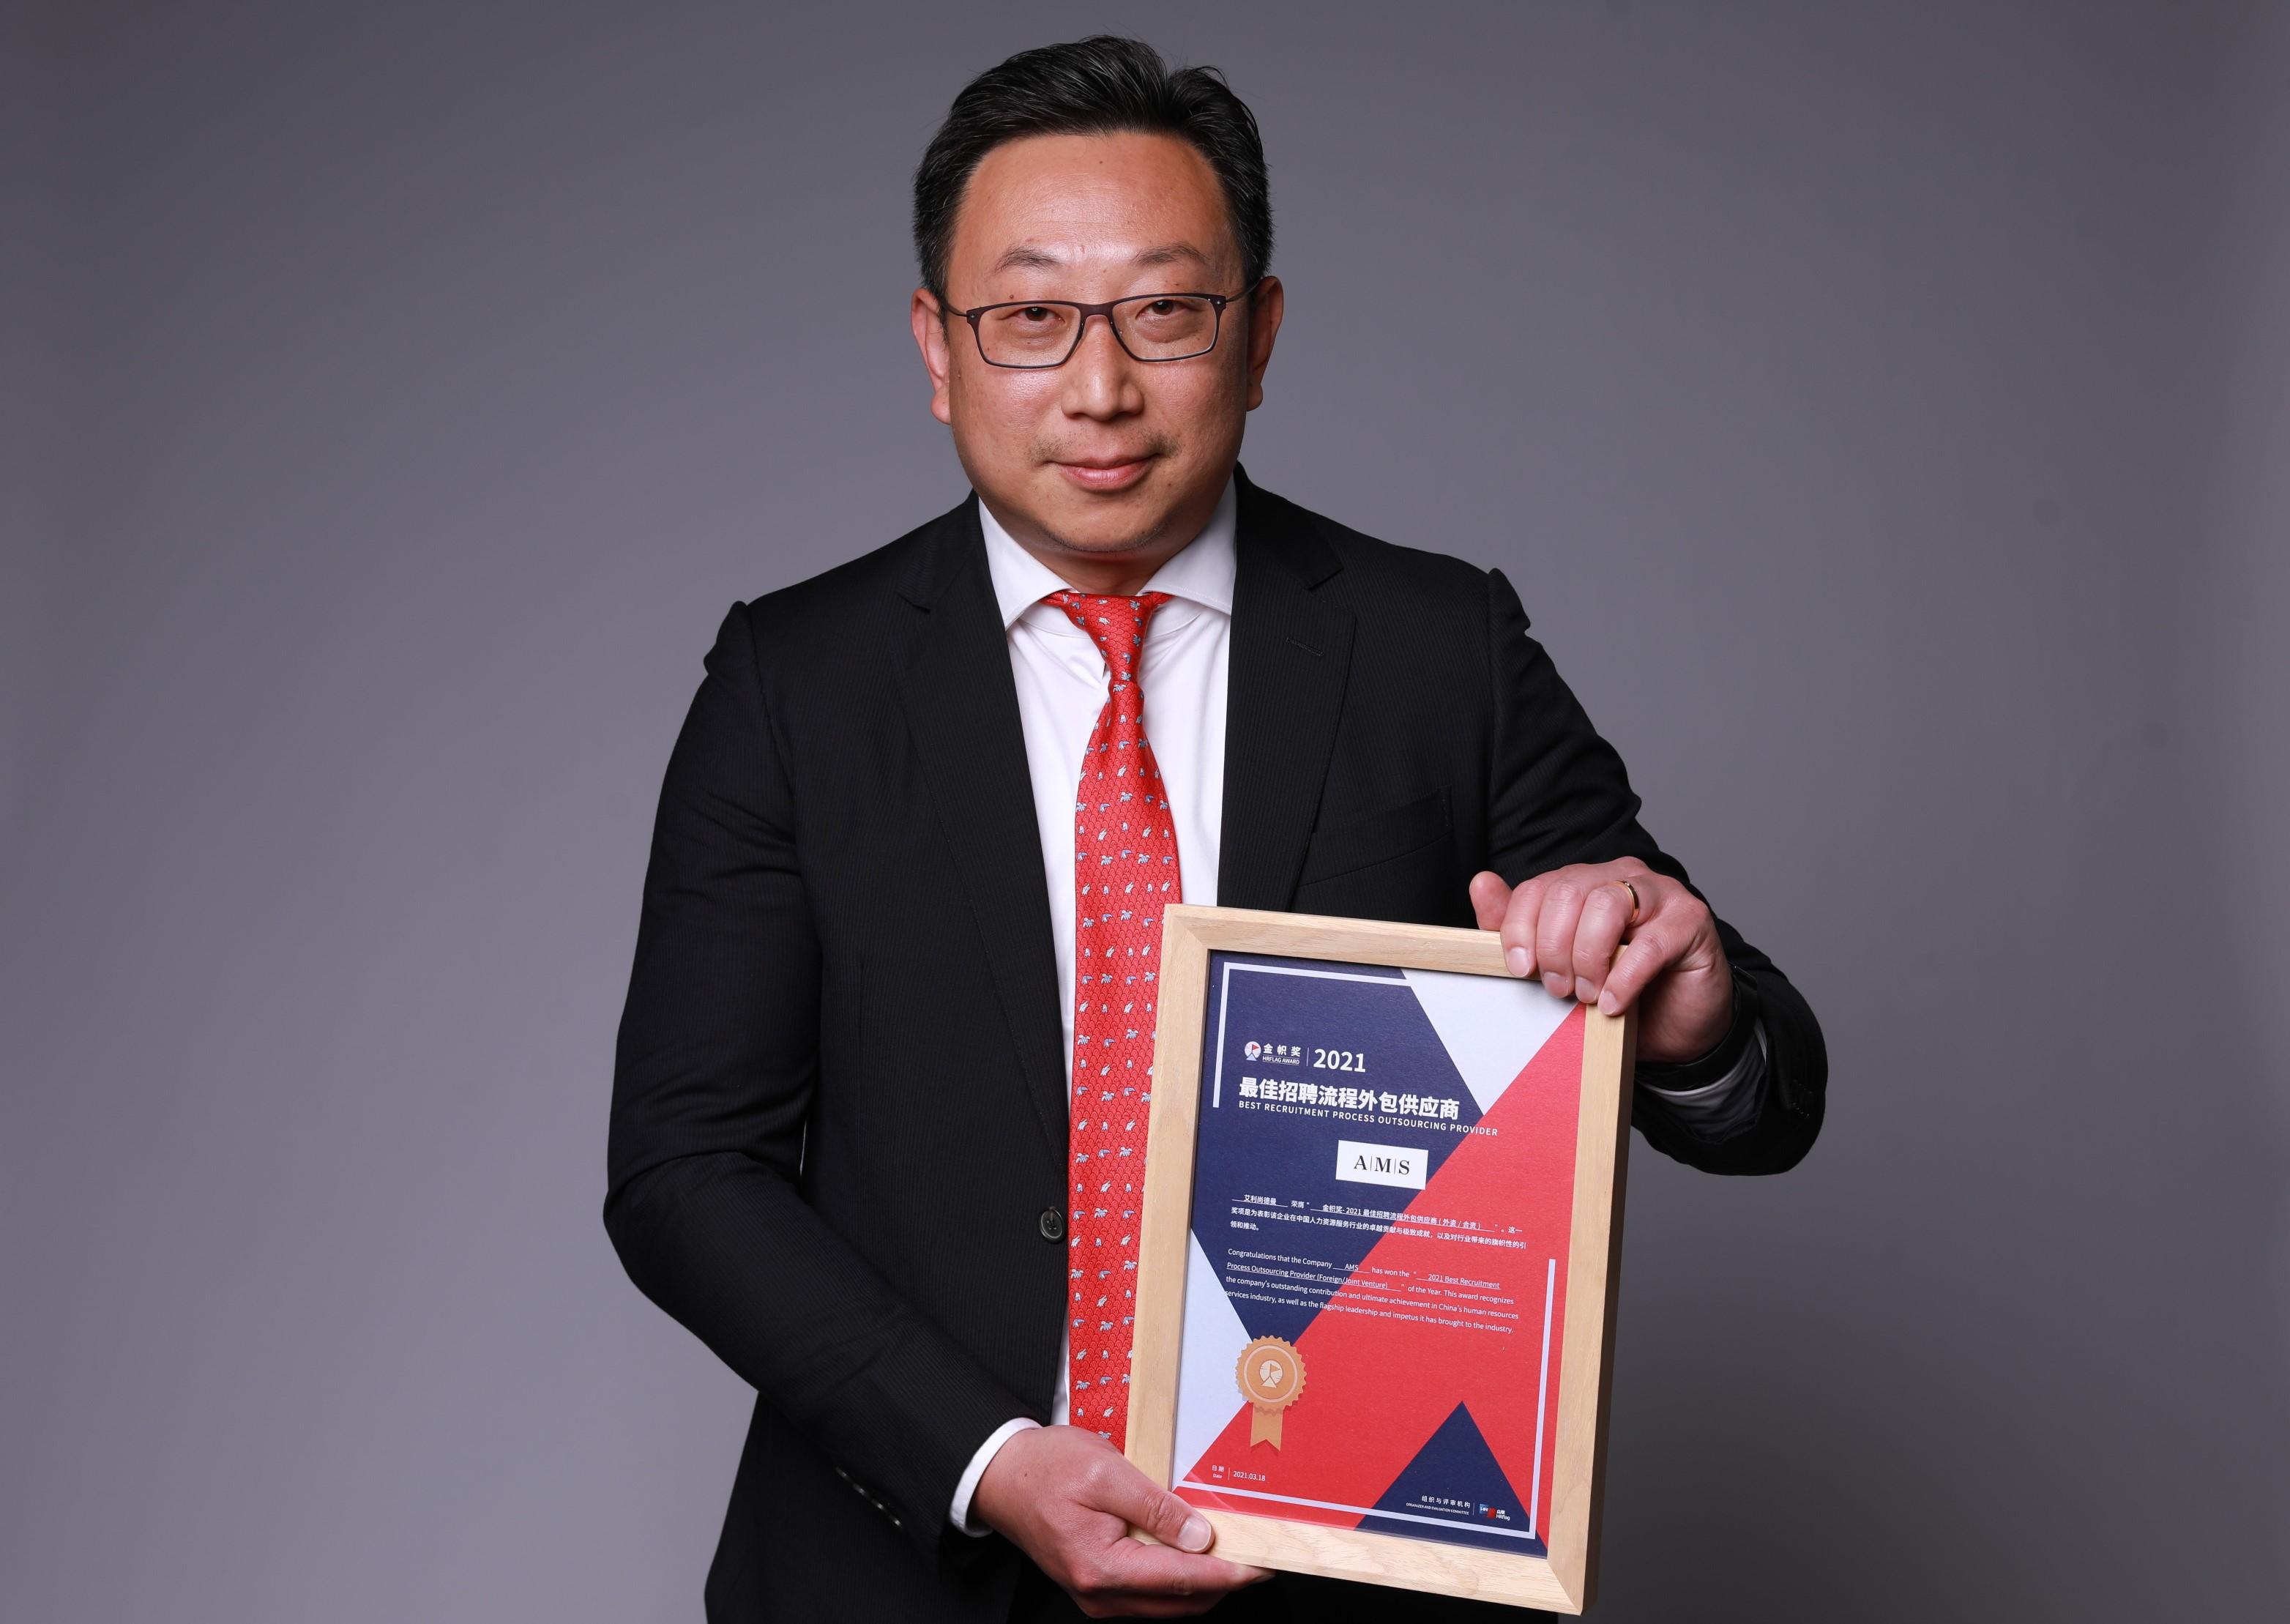 Kensy Sy receiving HRflag RPO award China